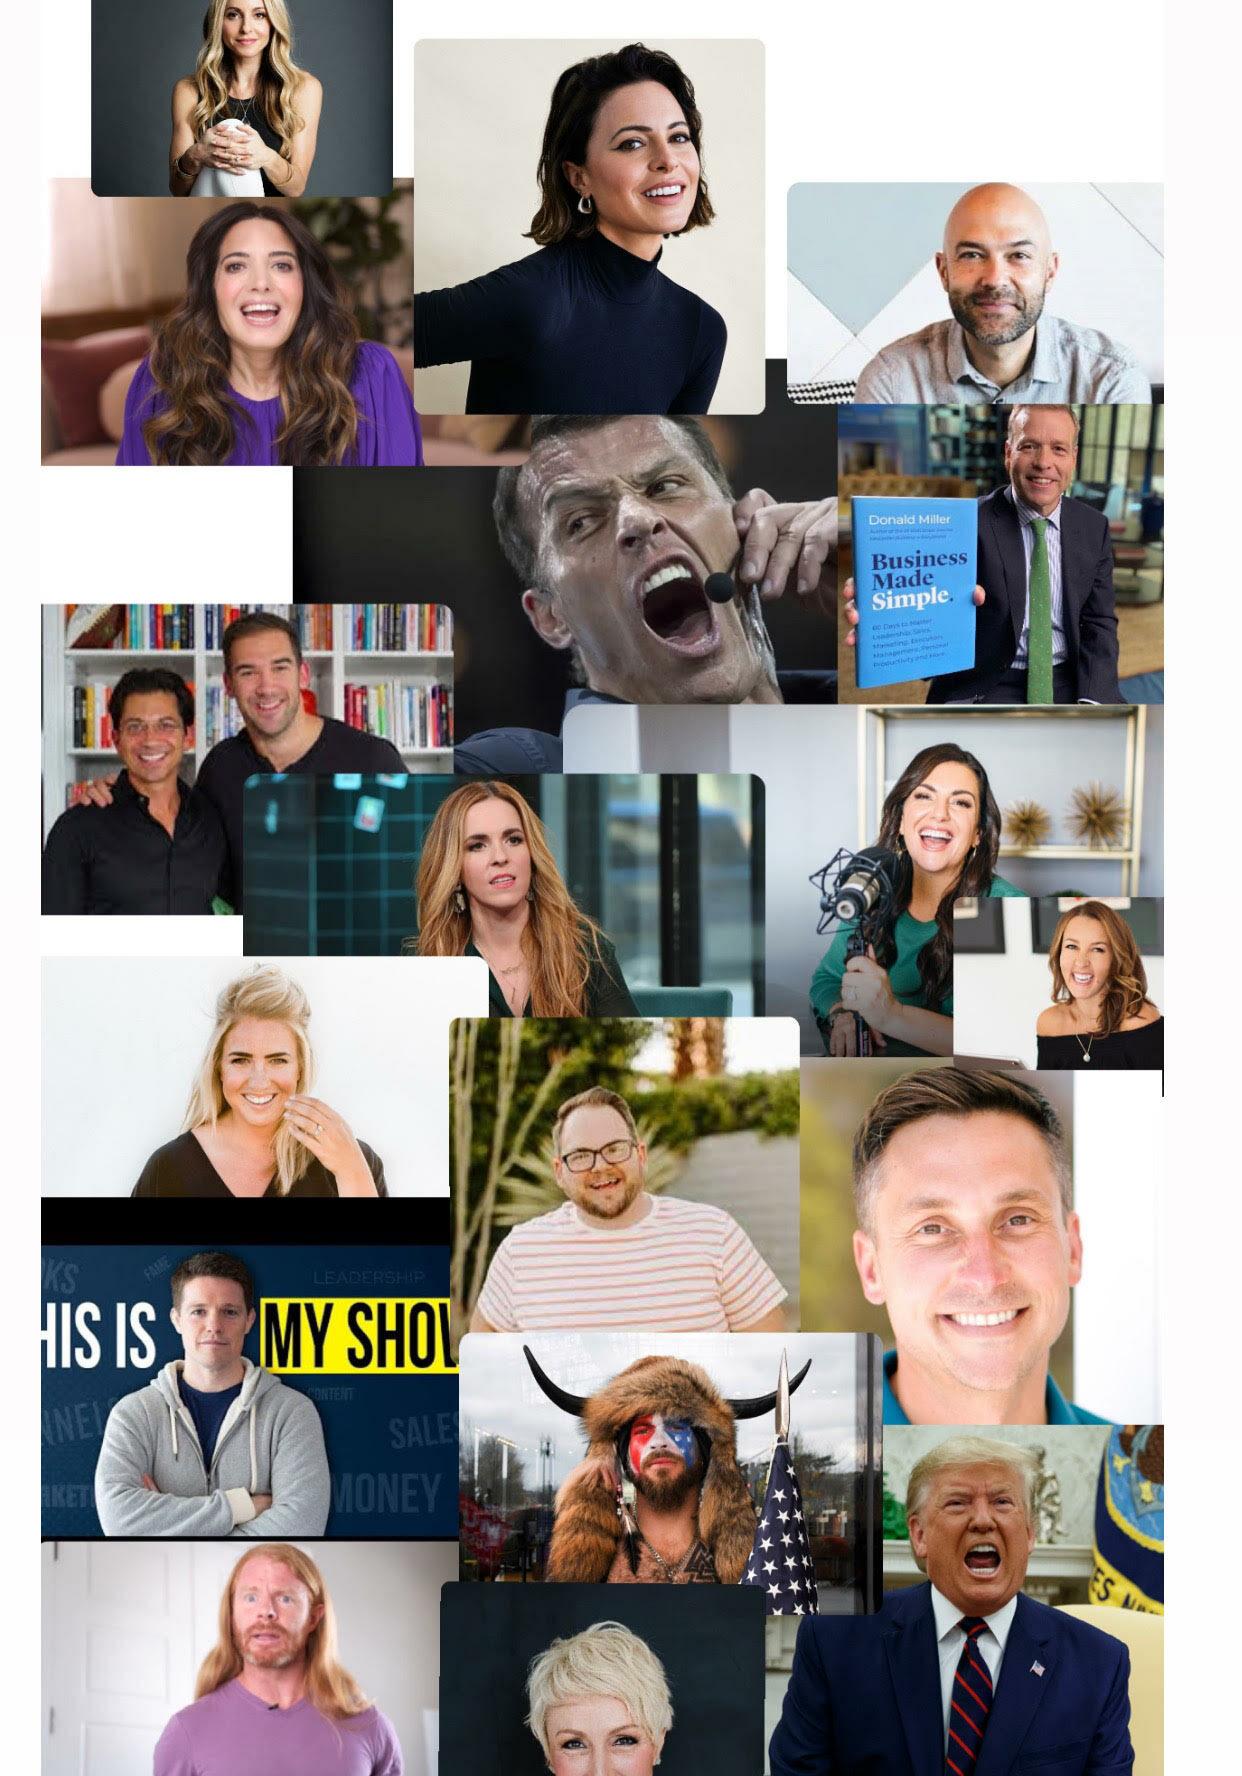 Online Marketing Cult Tony Robbins Marie Forleo Amy Porterfield Rachel Hollis Jenna kutcher